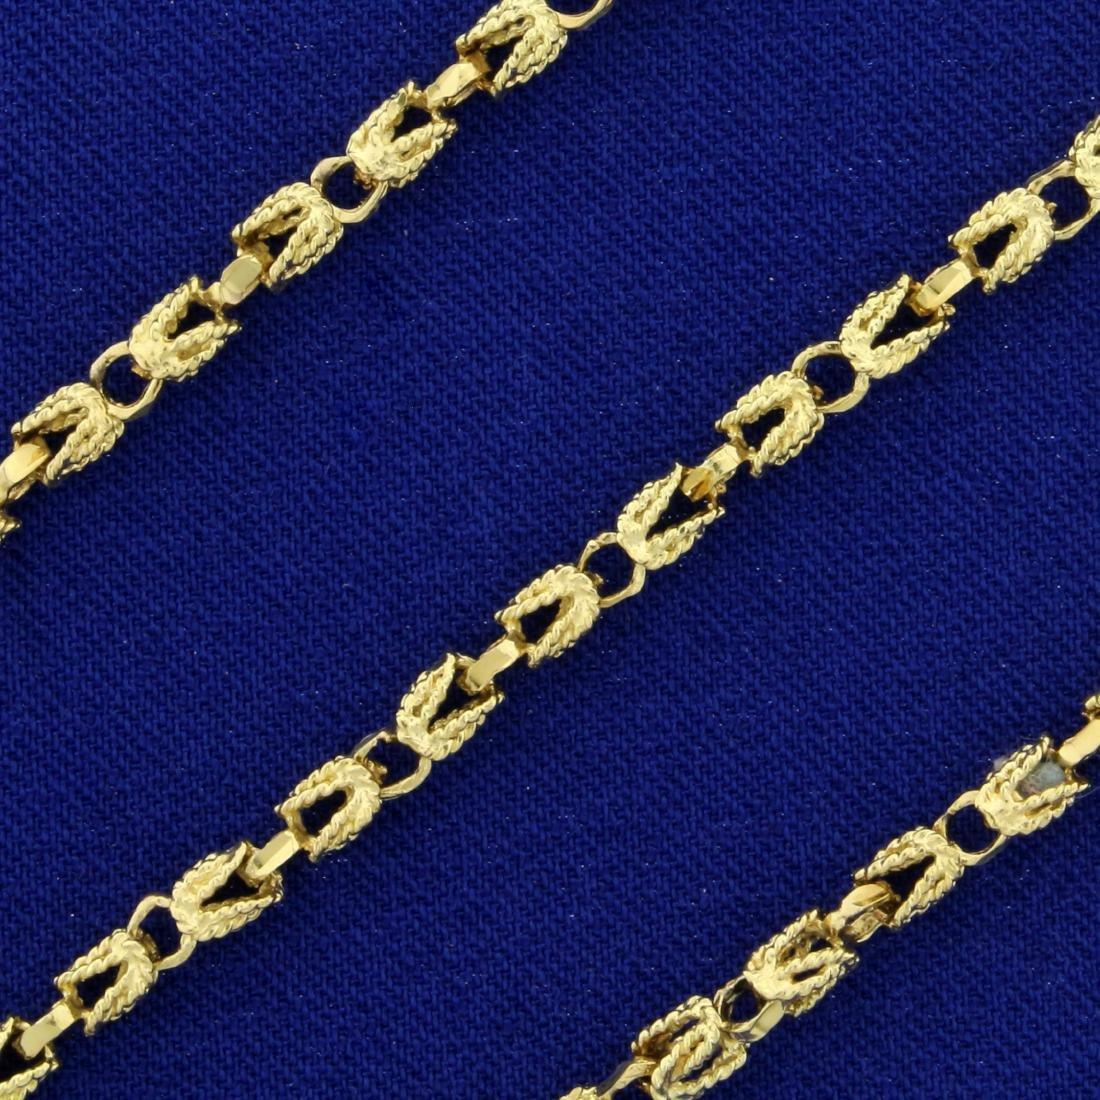 20 Inch Designer Link Neck Chain in 14K Yellow Gold - 2